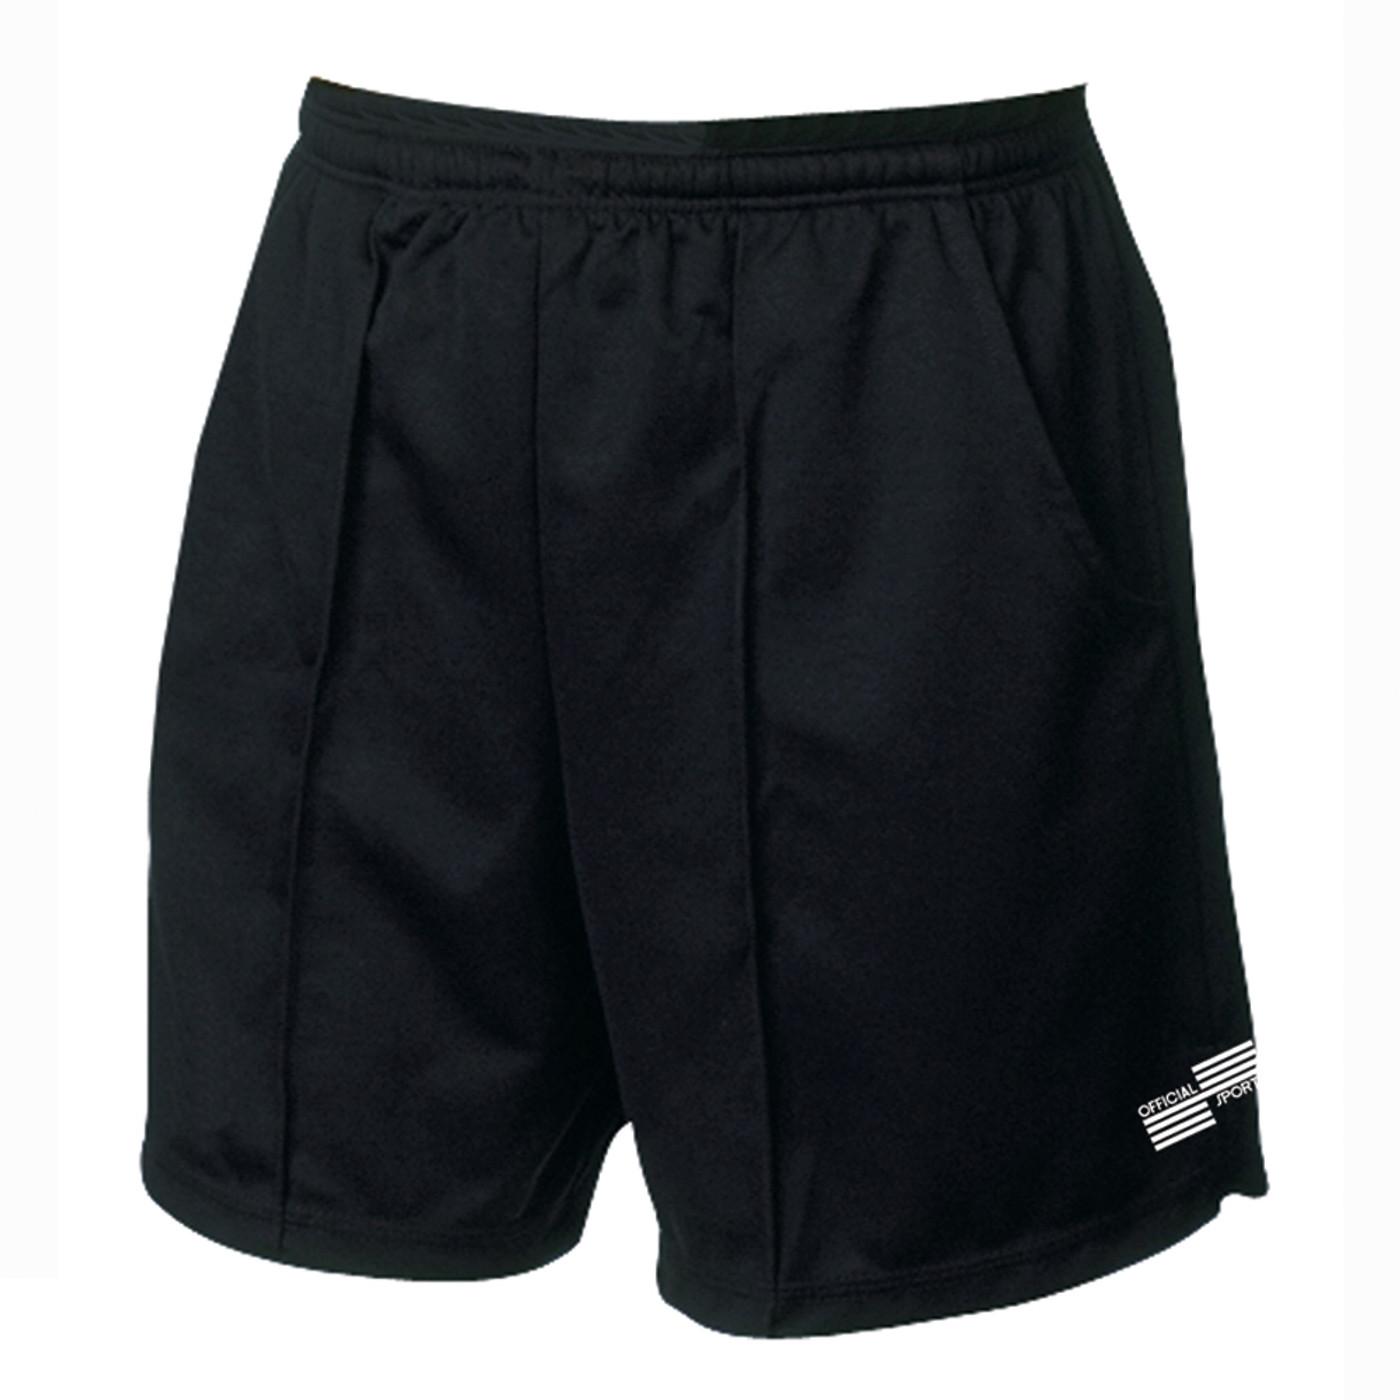 1058 OSI International Black Short